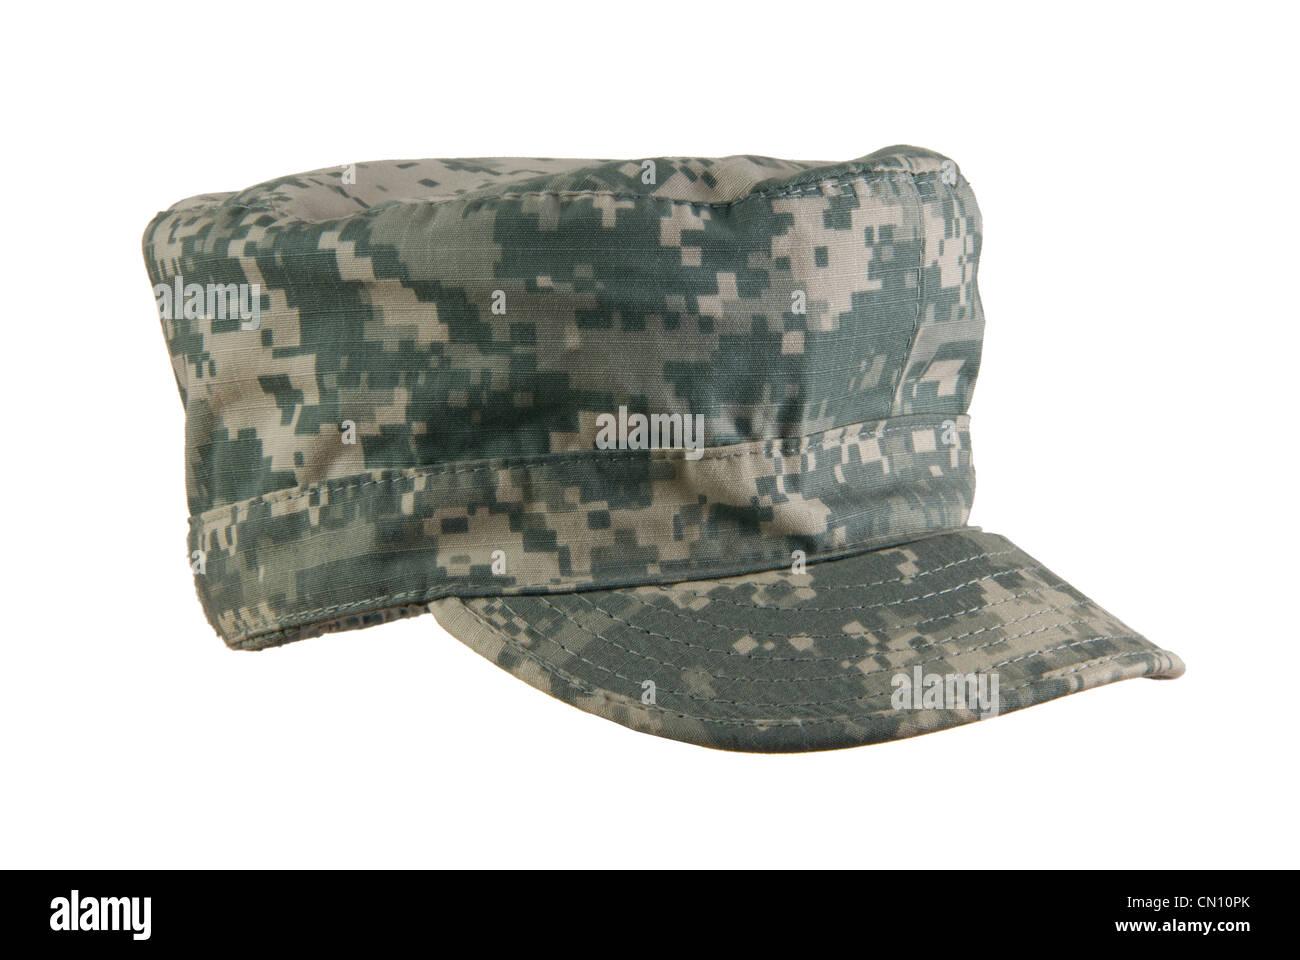 44ea84056899ca cap,hat,military,bandana,cutout,isolated,white background,police,swat,fbi